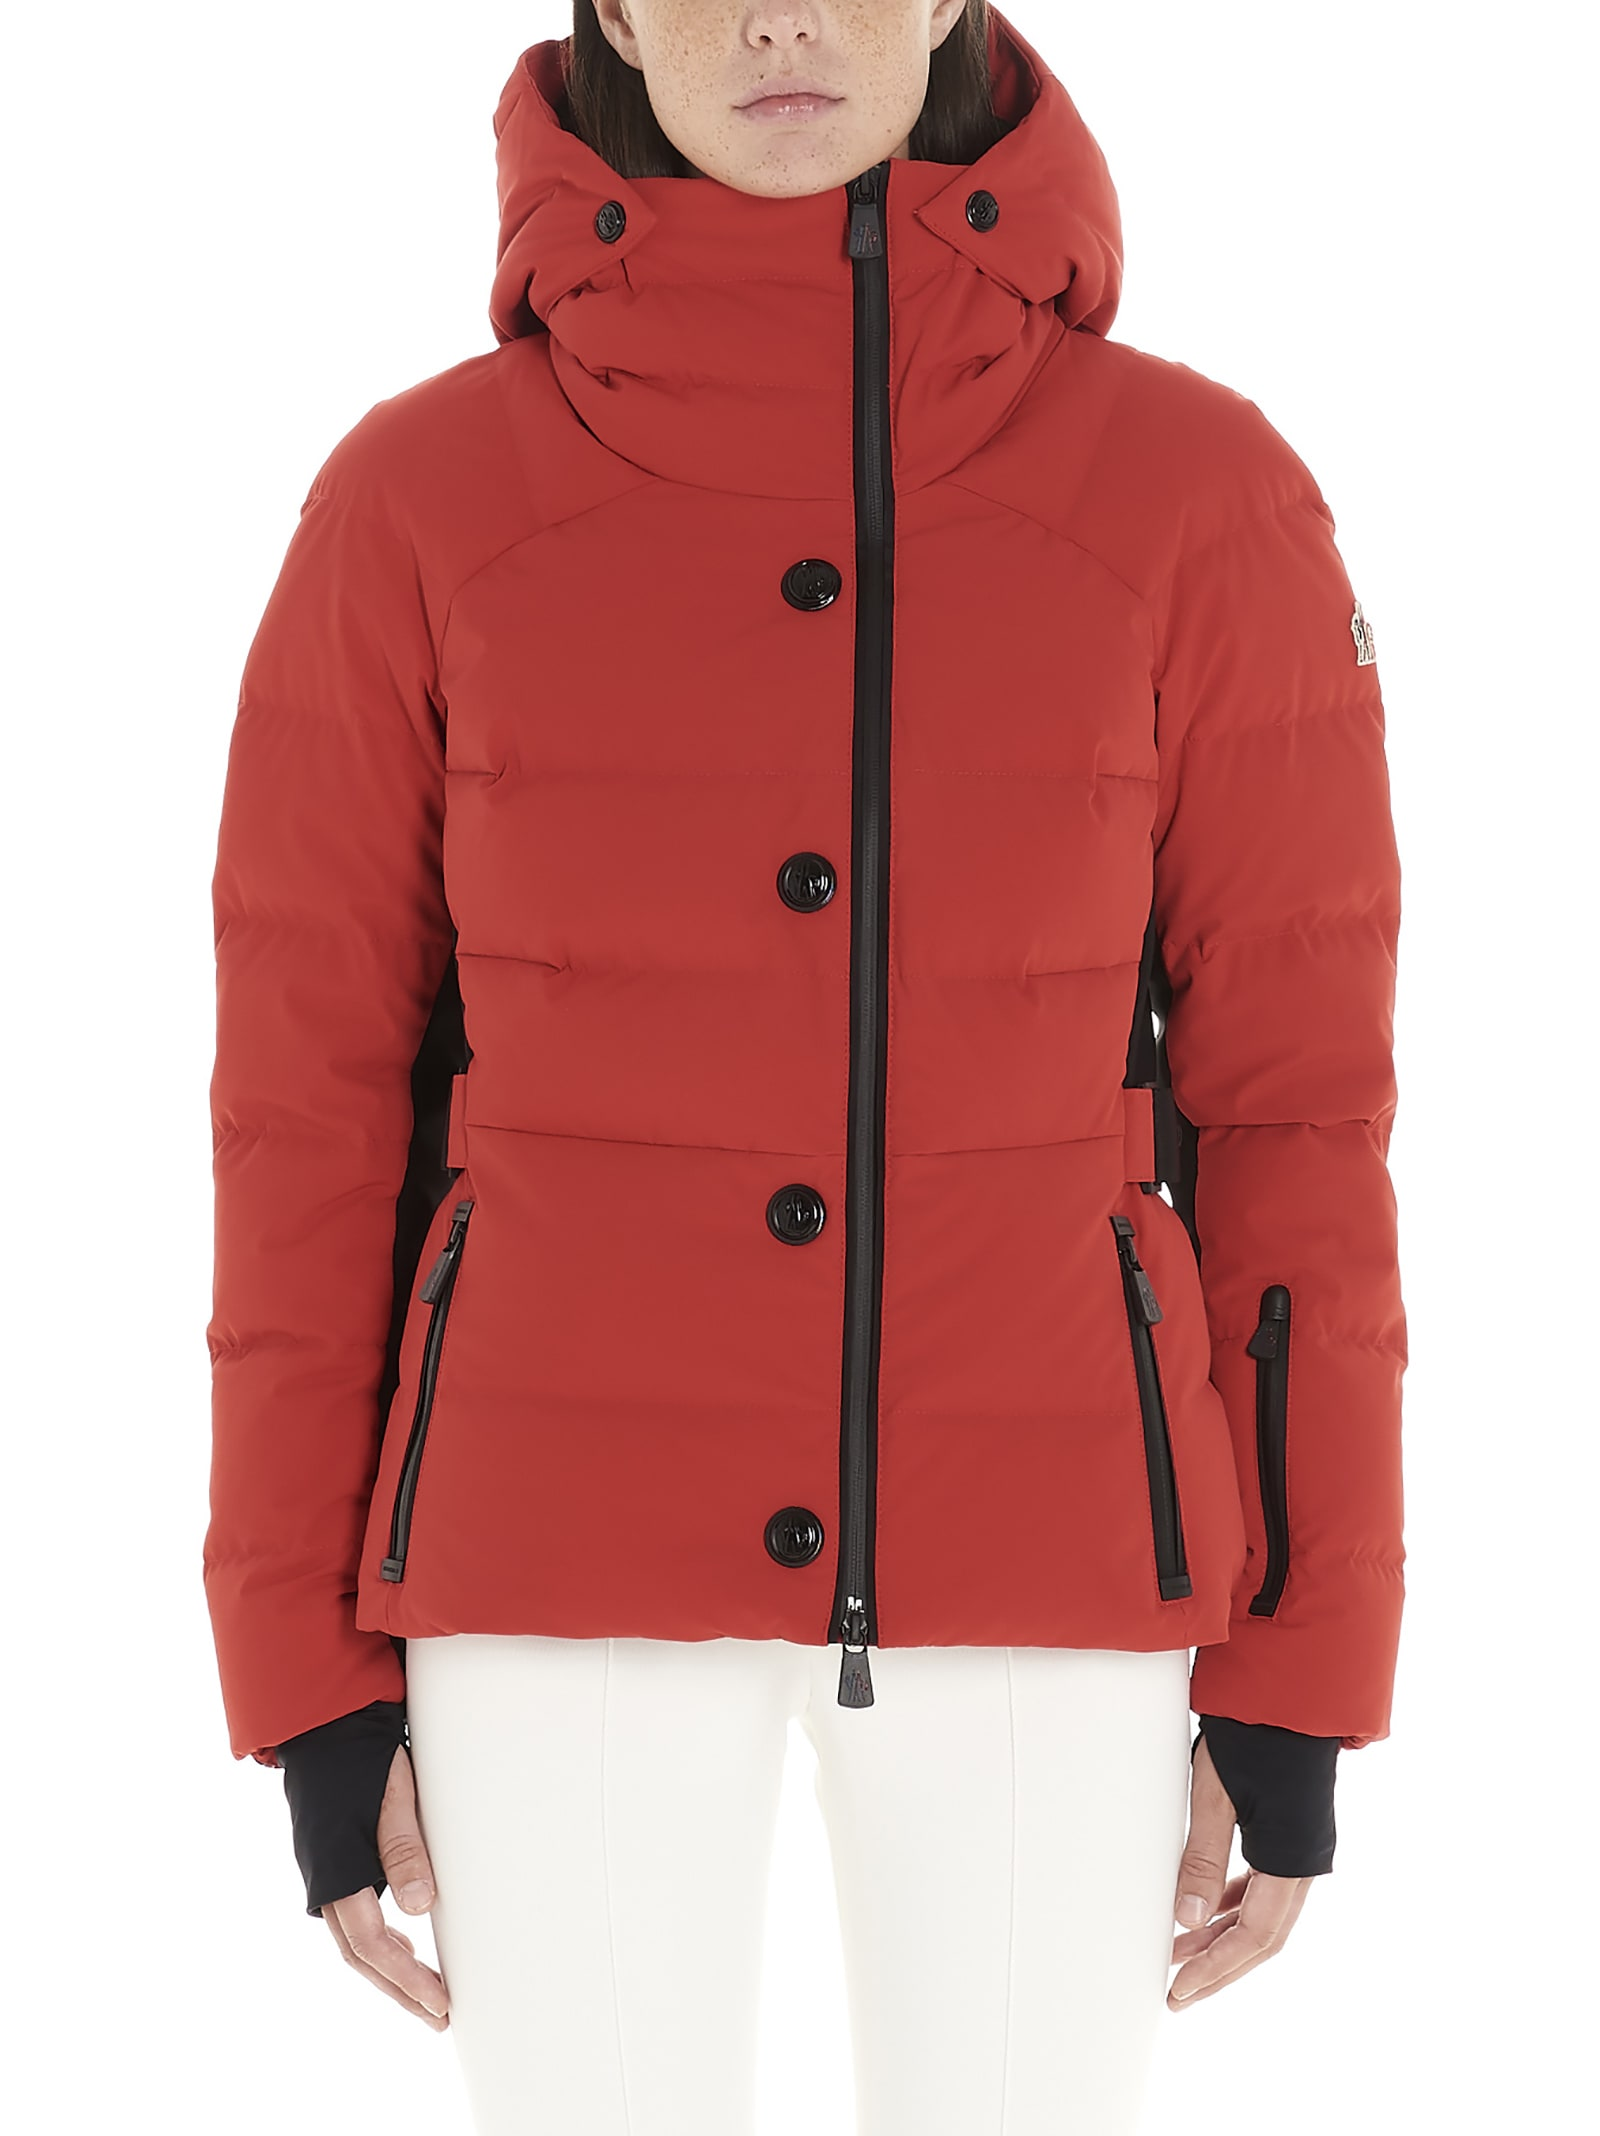 Moncler Grenoble guyane Jacket